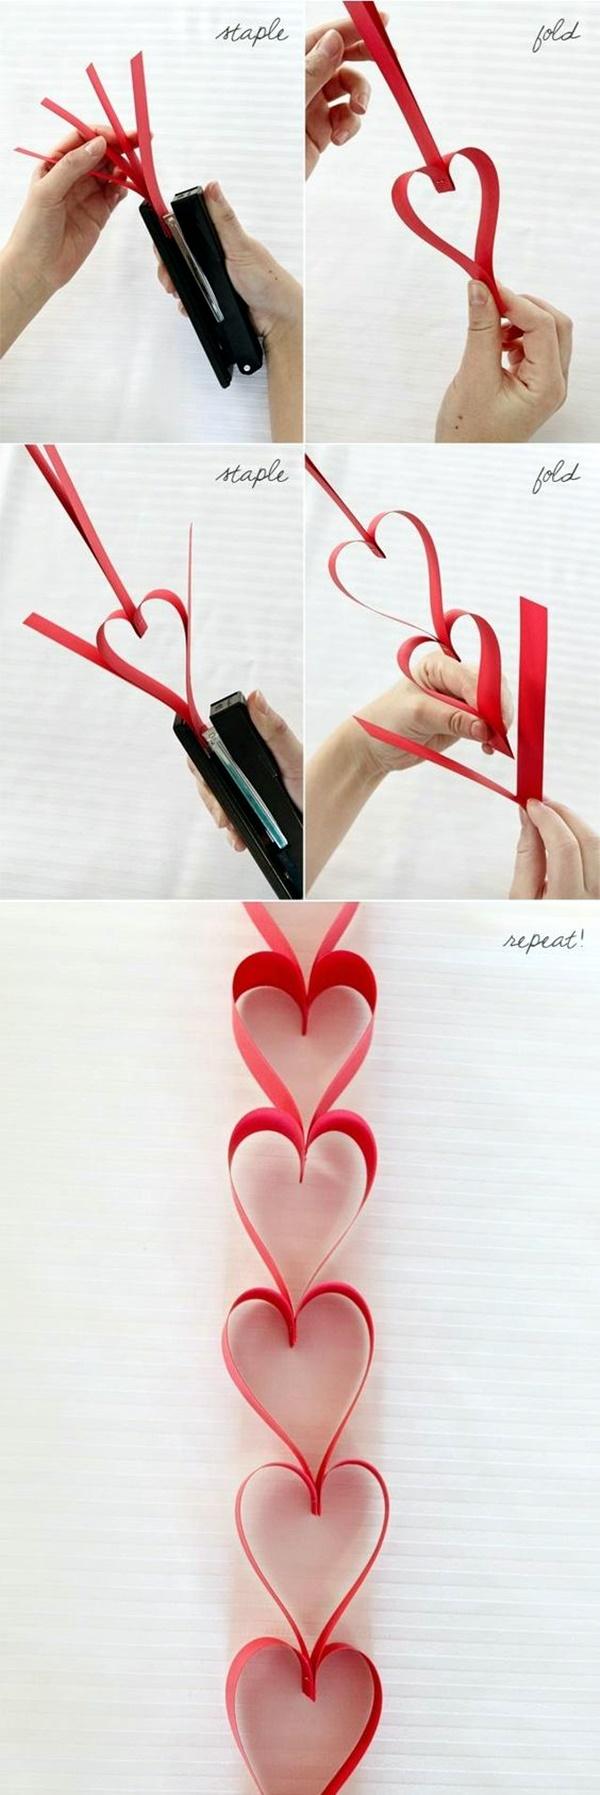 valentines-crafts-for-kids-1